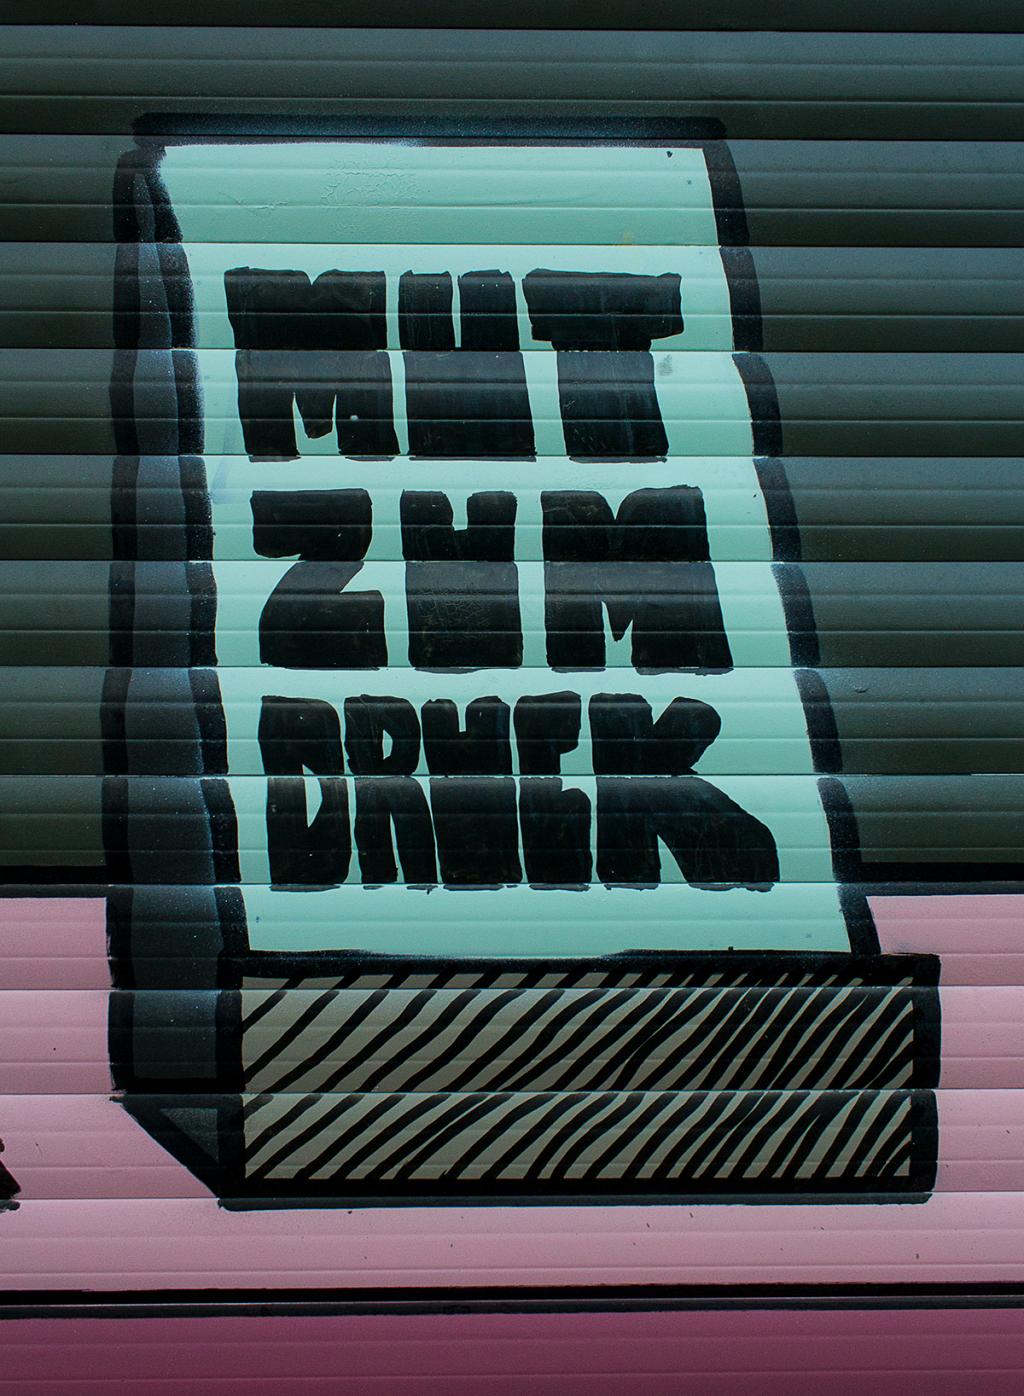 Martin Gnadt — Kommunikationsdesign ERLESEN mural